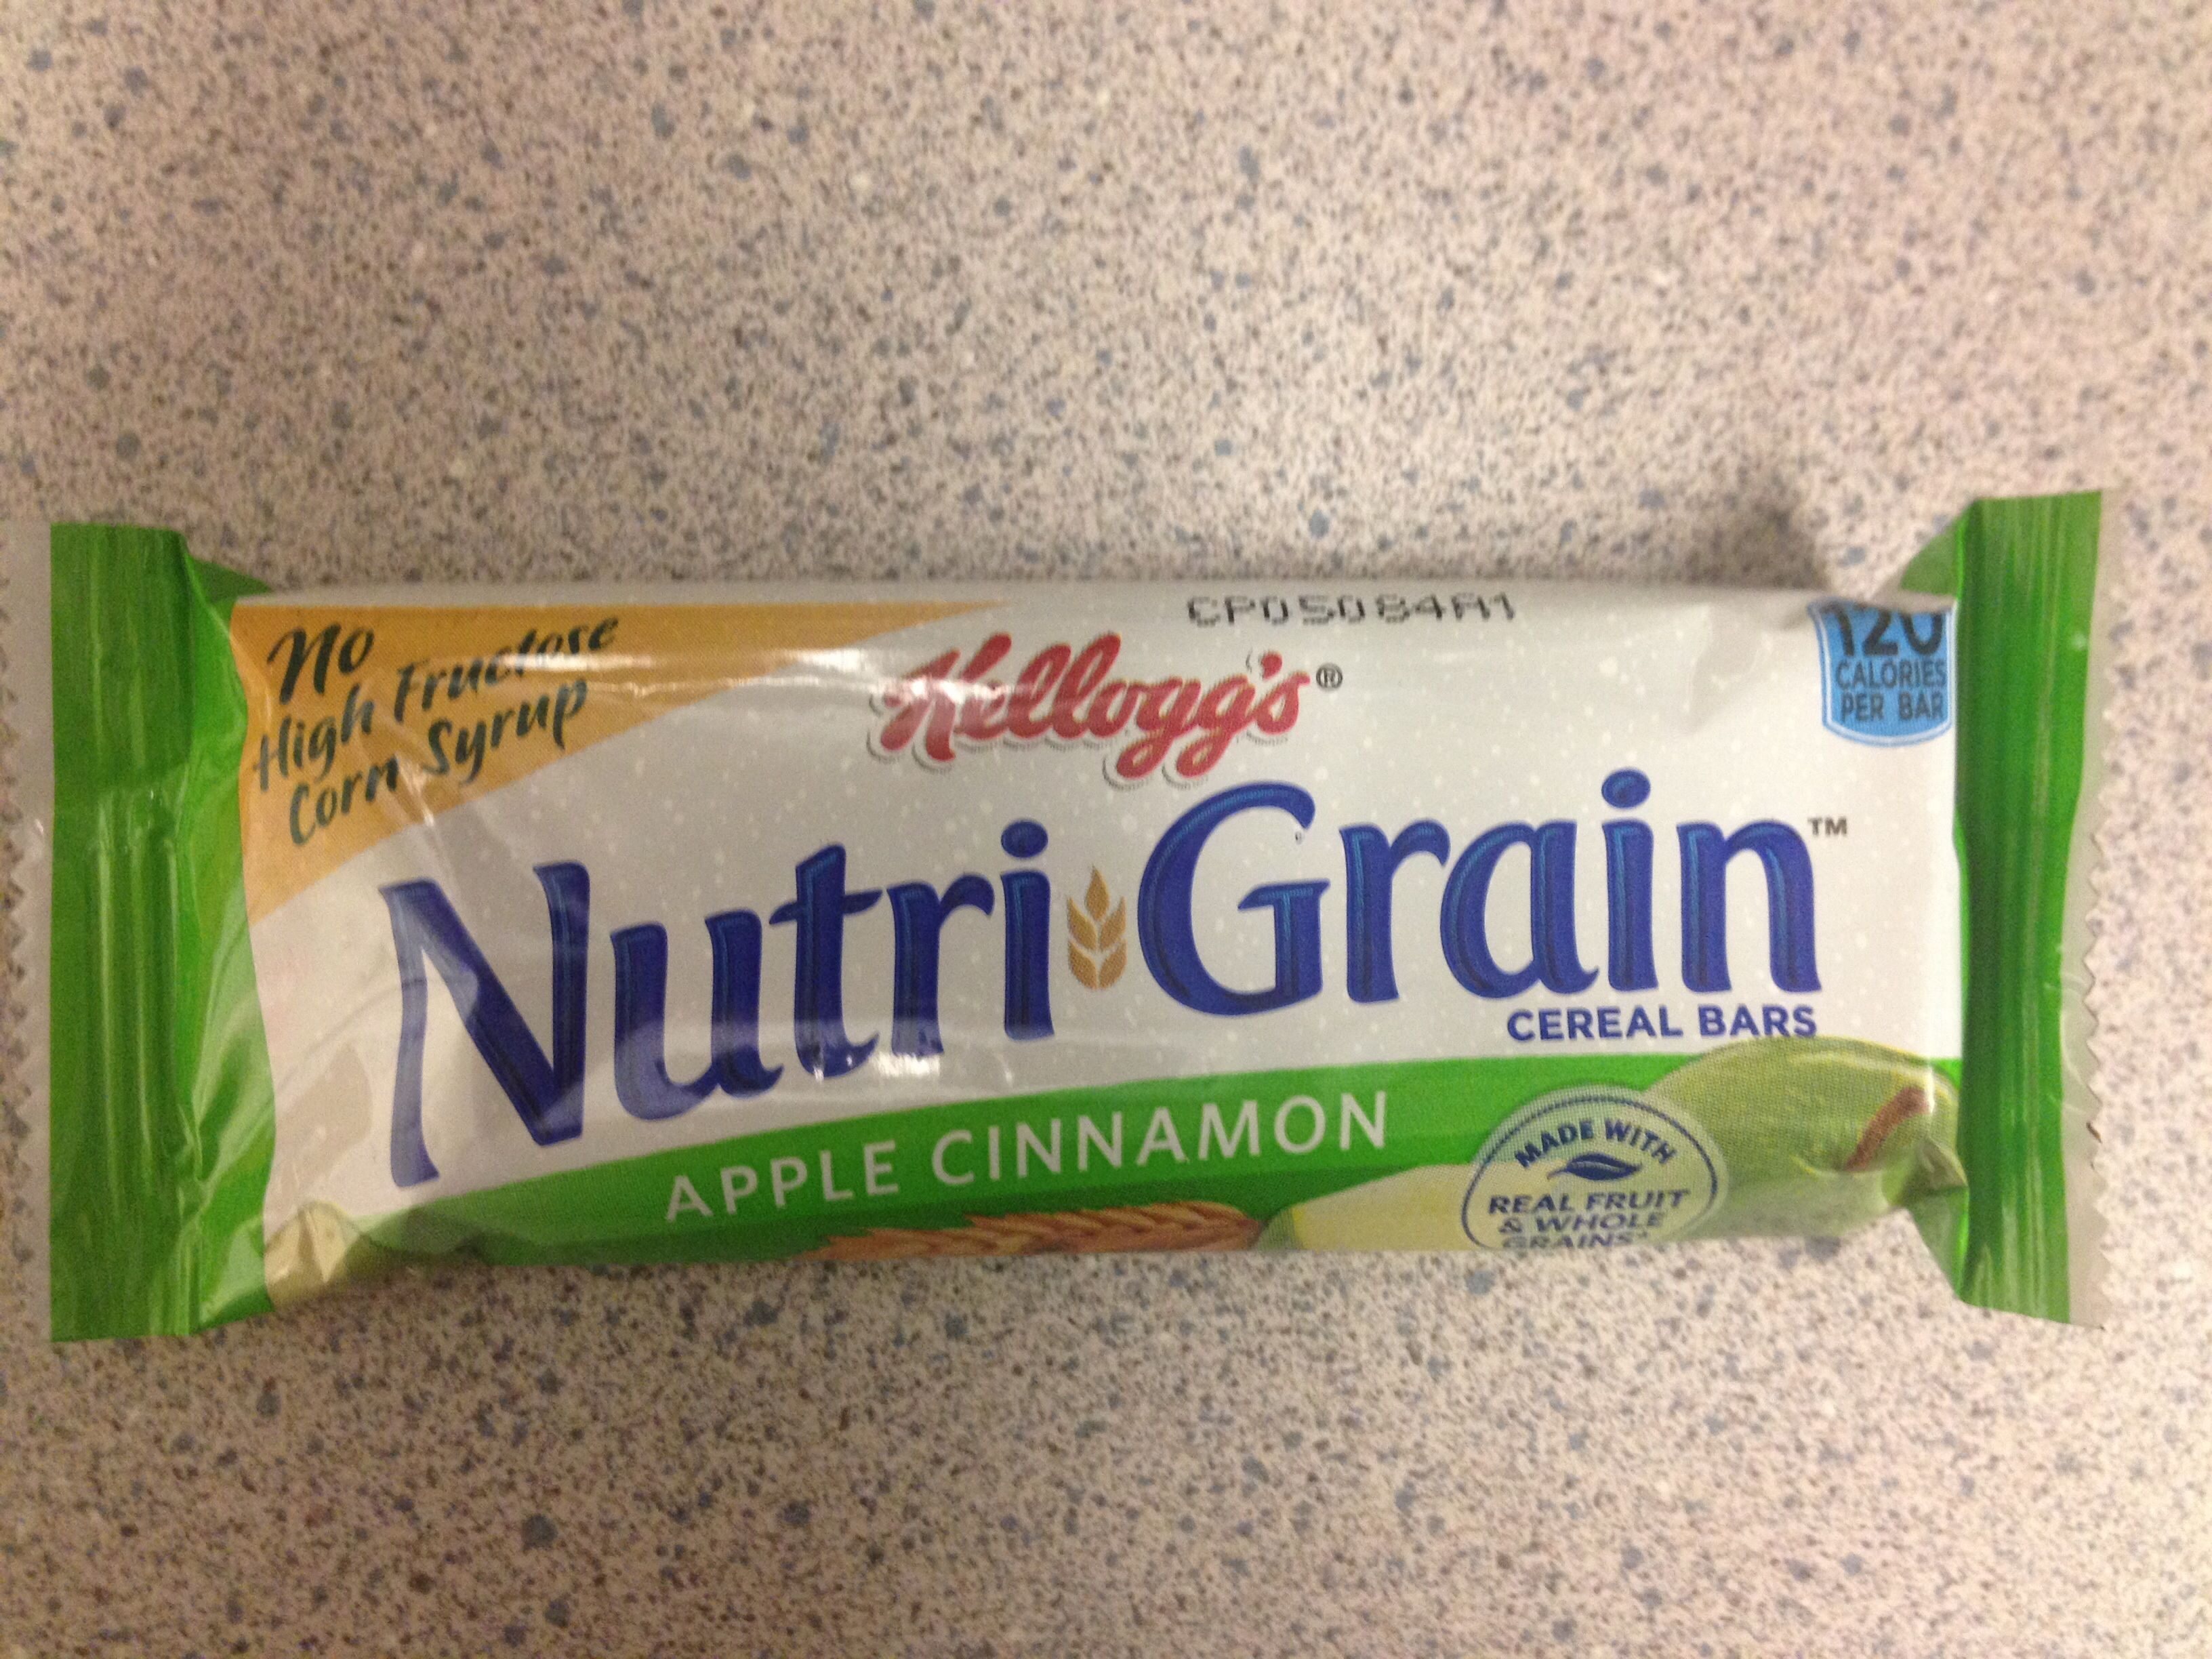 Kellogg's Nutri-Grain Cereal Bars Apple Cinnamon 1.3oz - Product - en